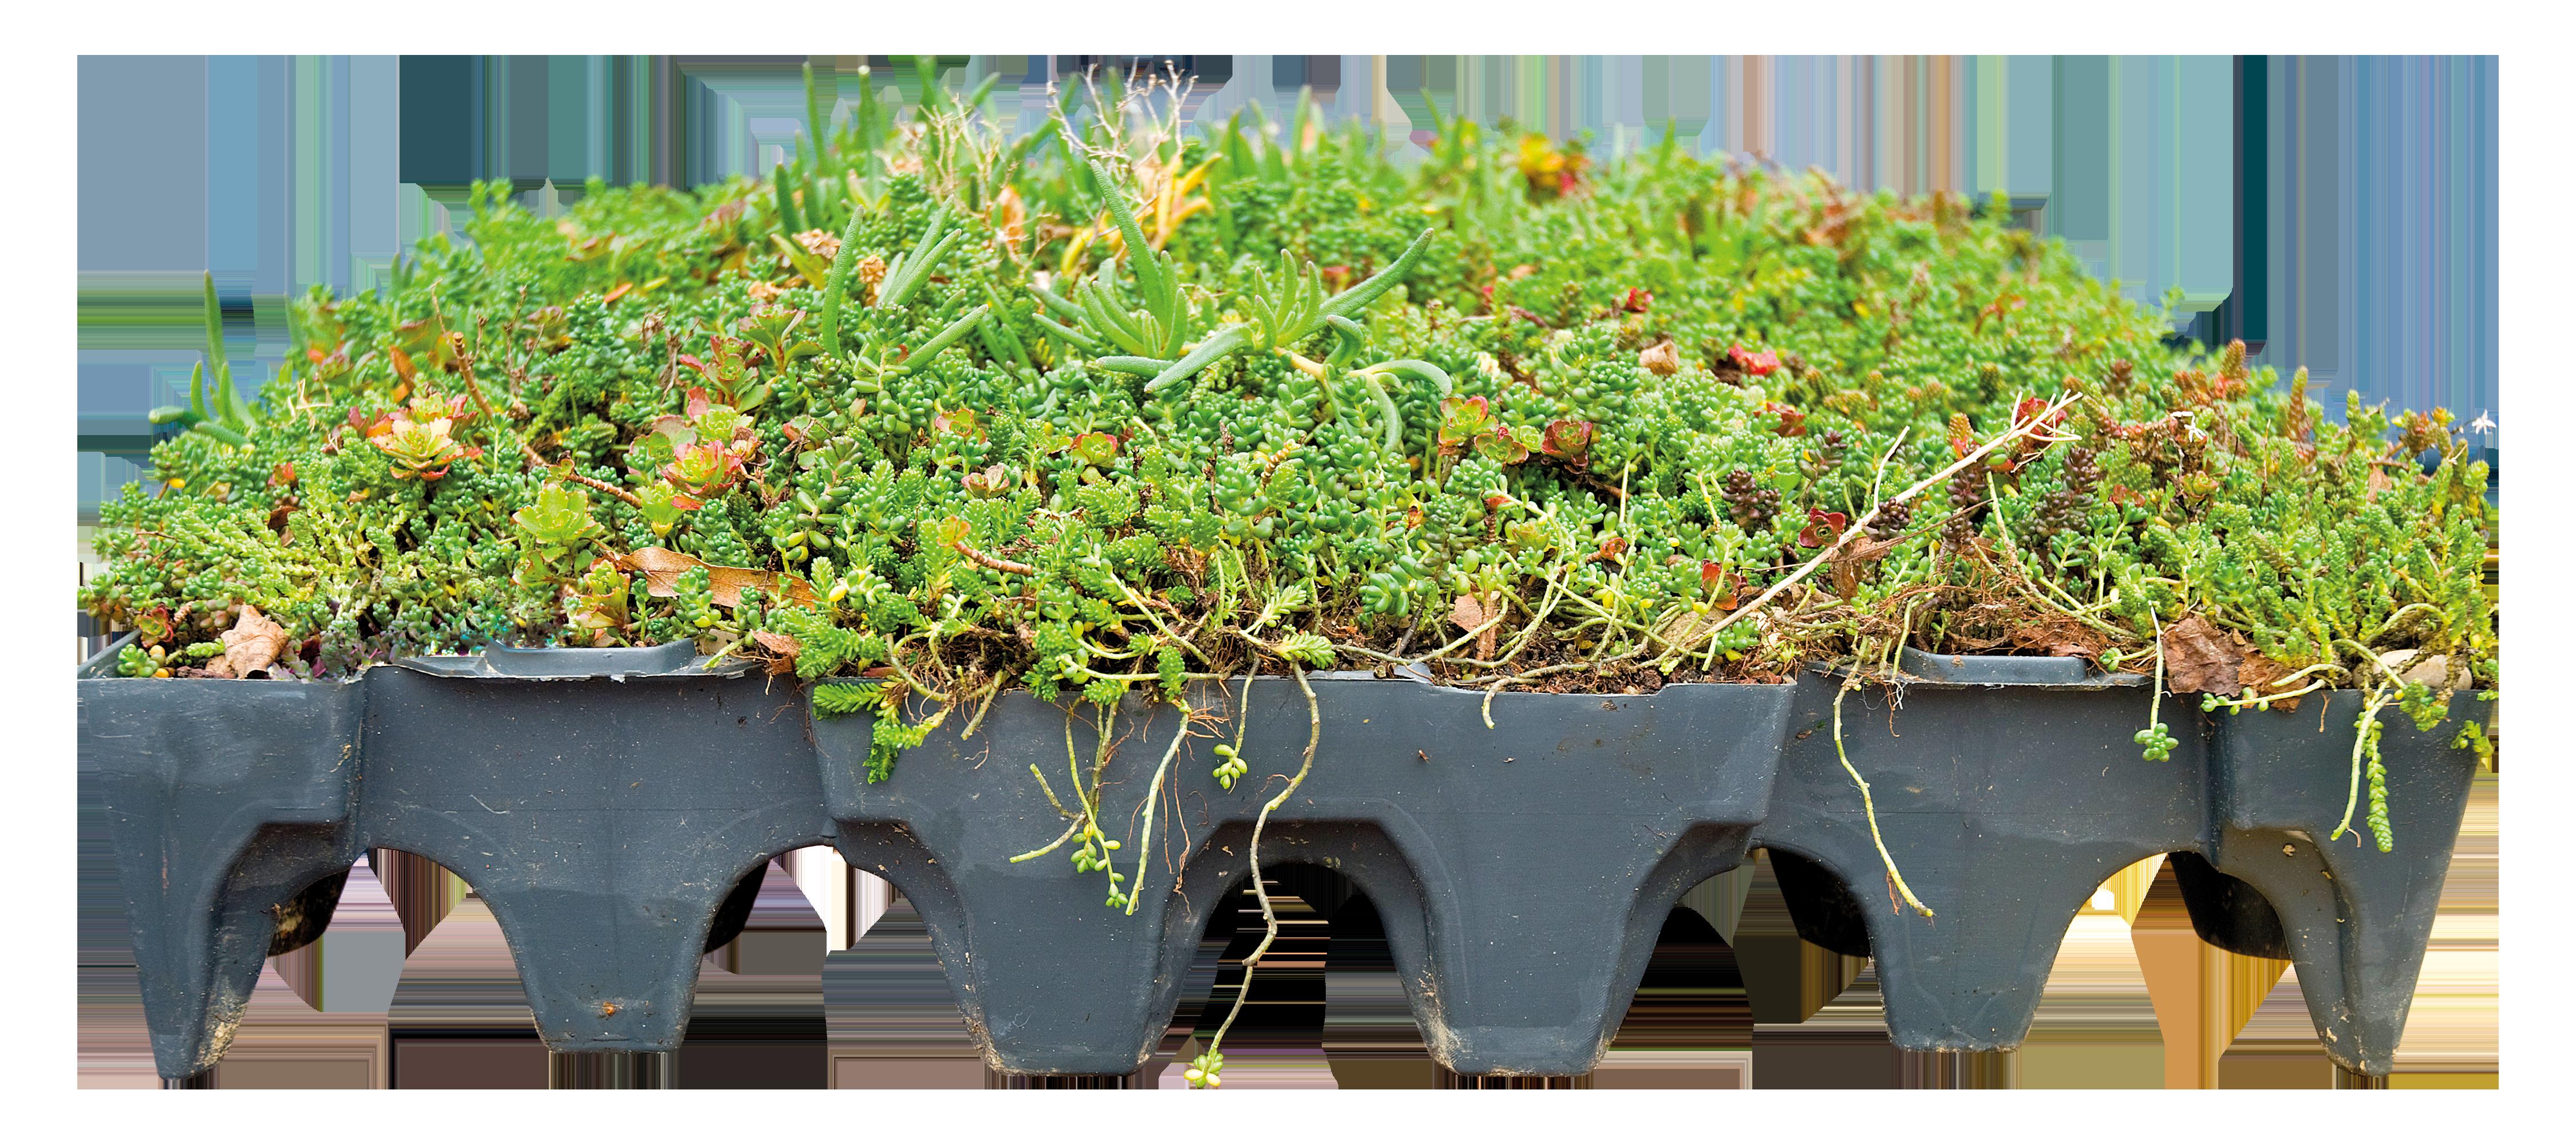 Groendaken & daktuinen | Groendak bedekking | Royal Roofing Materials